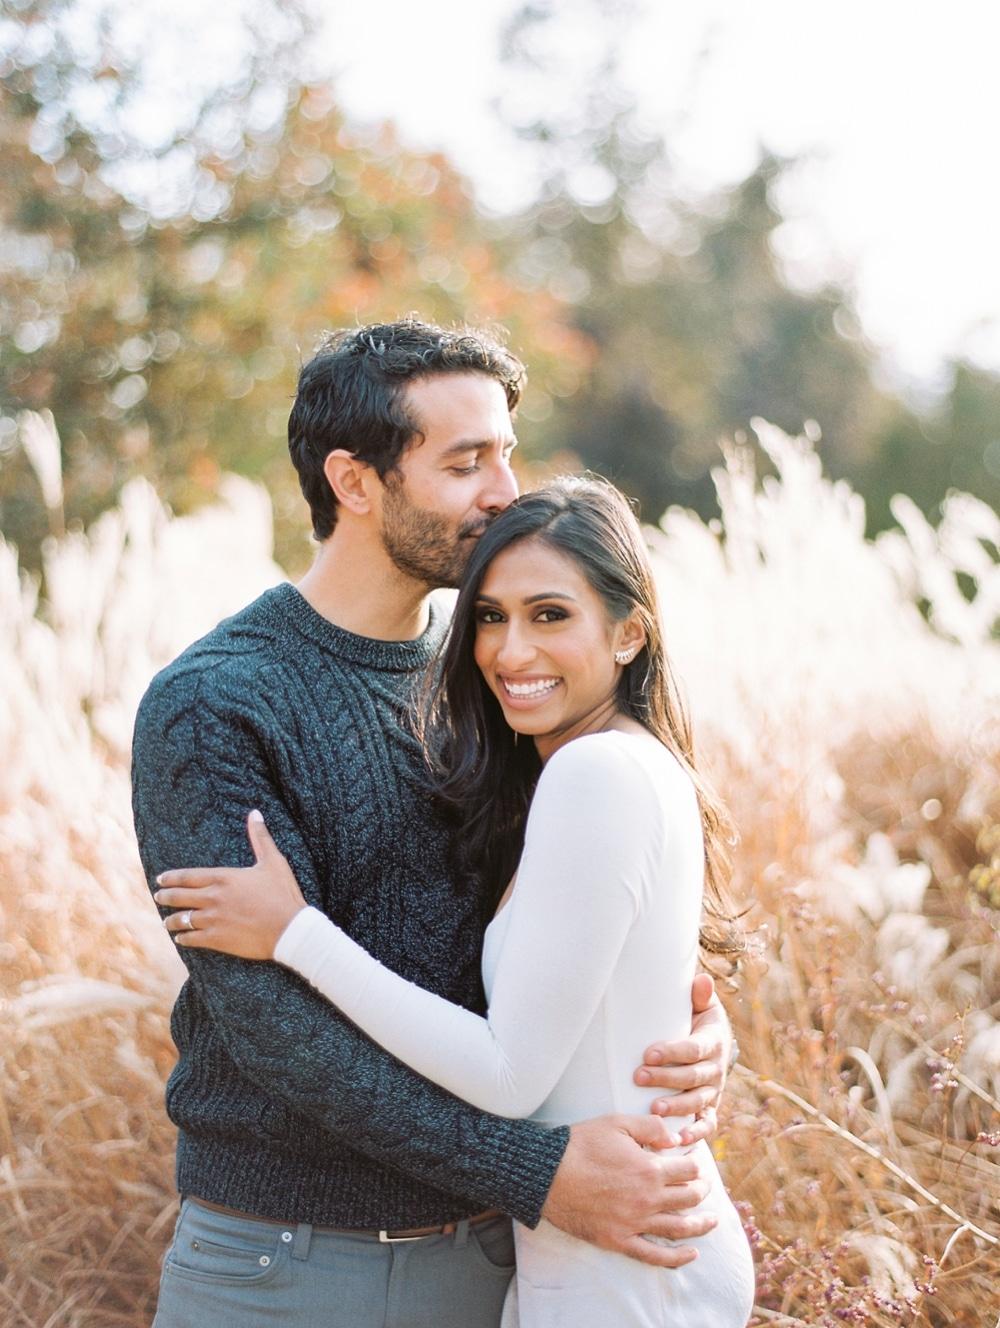 Kristin-La-Voie-Photography-morton-arboretum-chicago-wedding-photographer-43